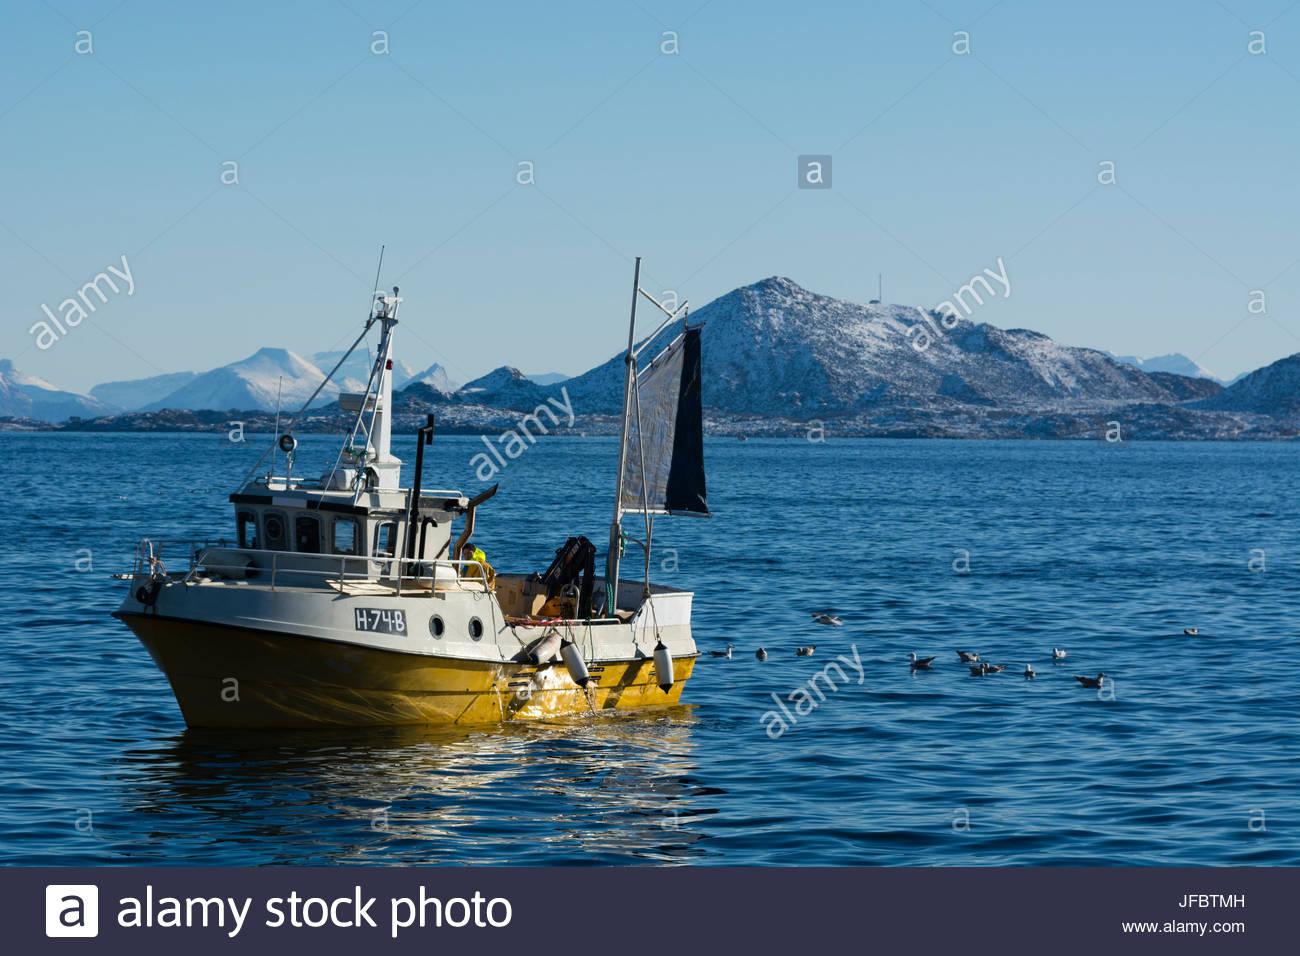 A fishing boat in Svolvaer Bay. - Stock Image